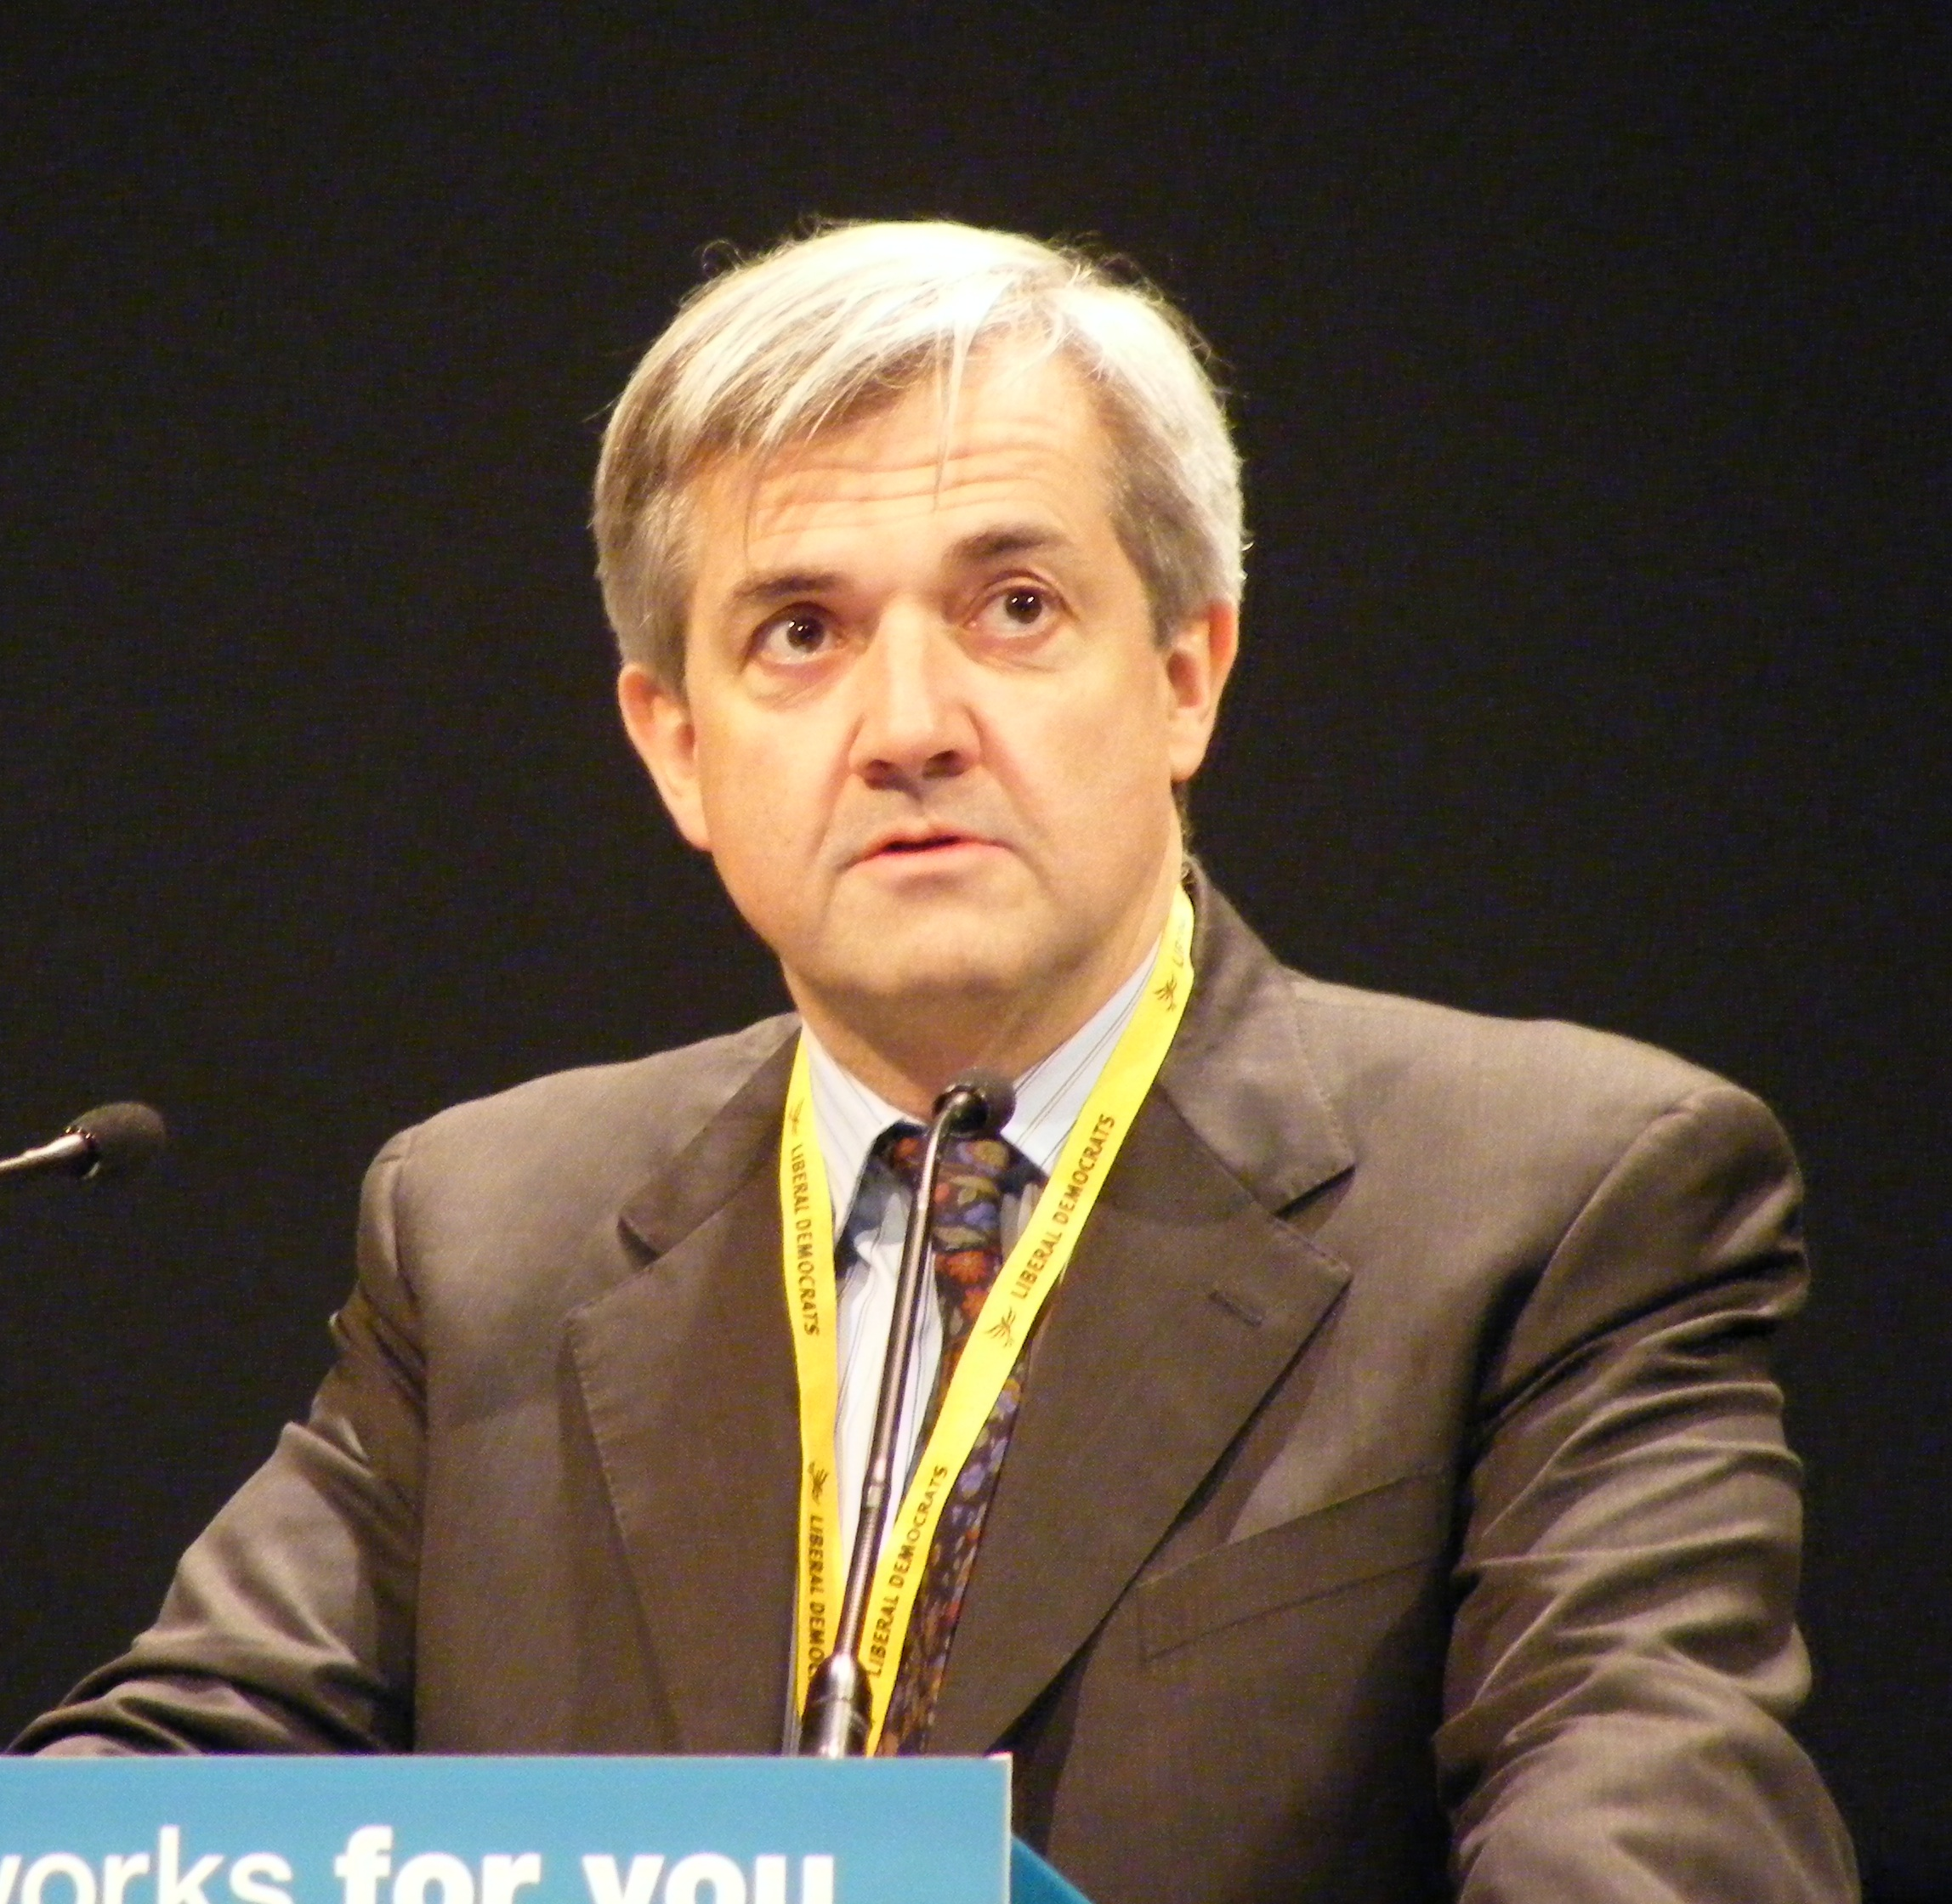 Chris Huhne - Wikipedia